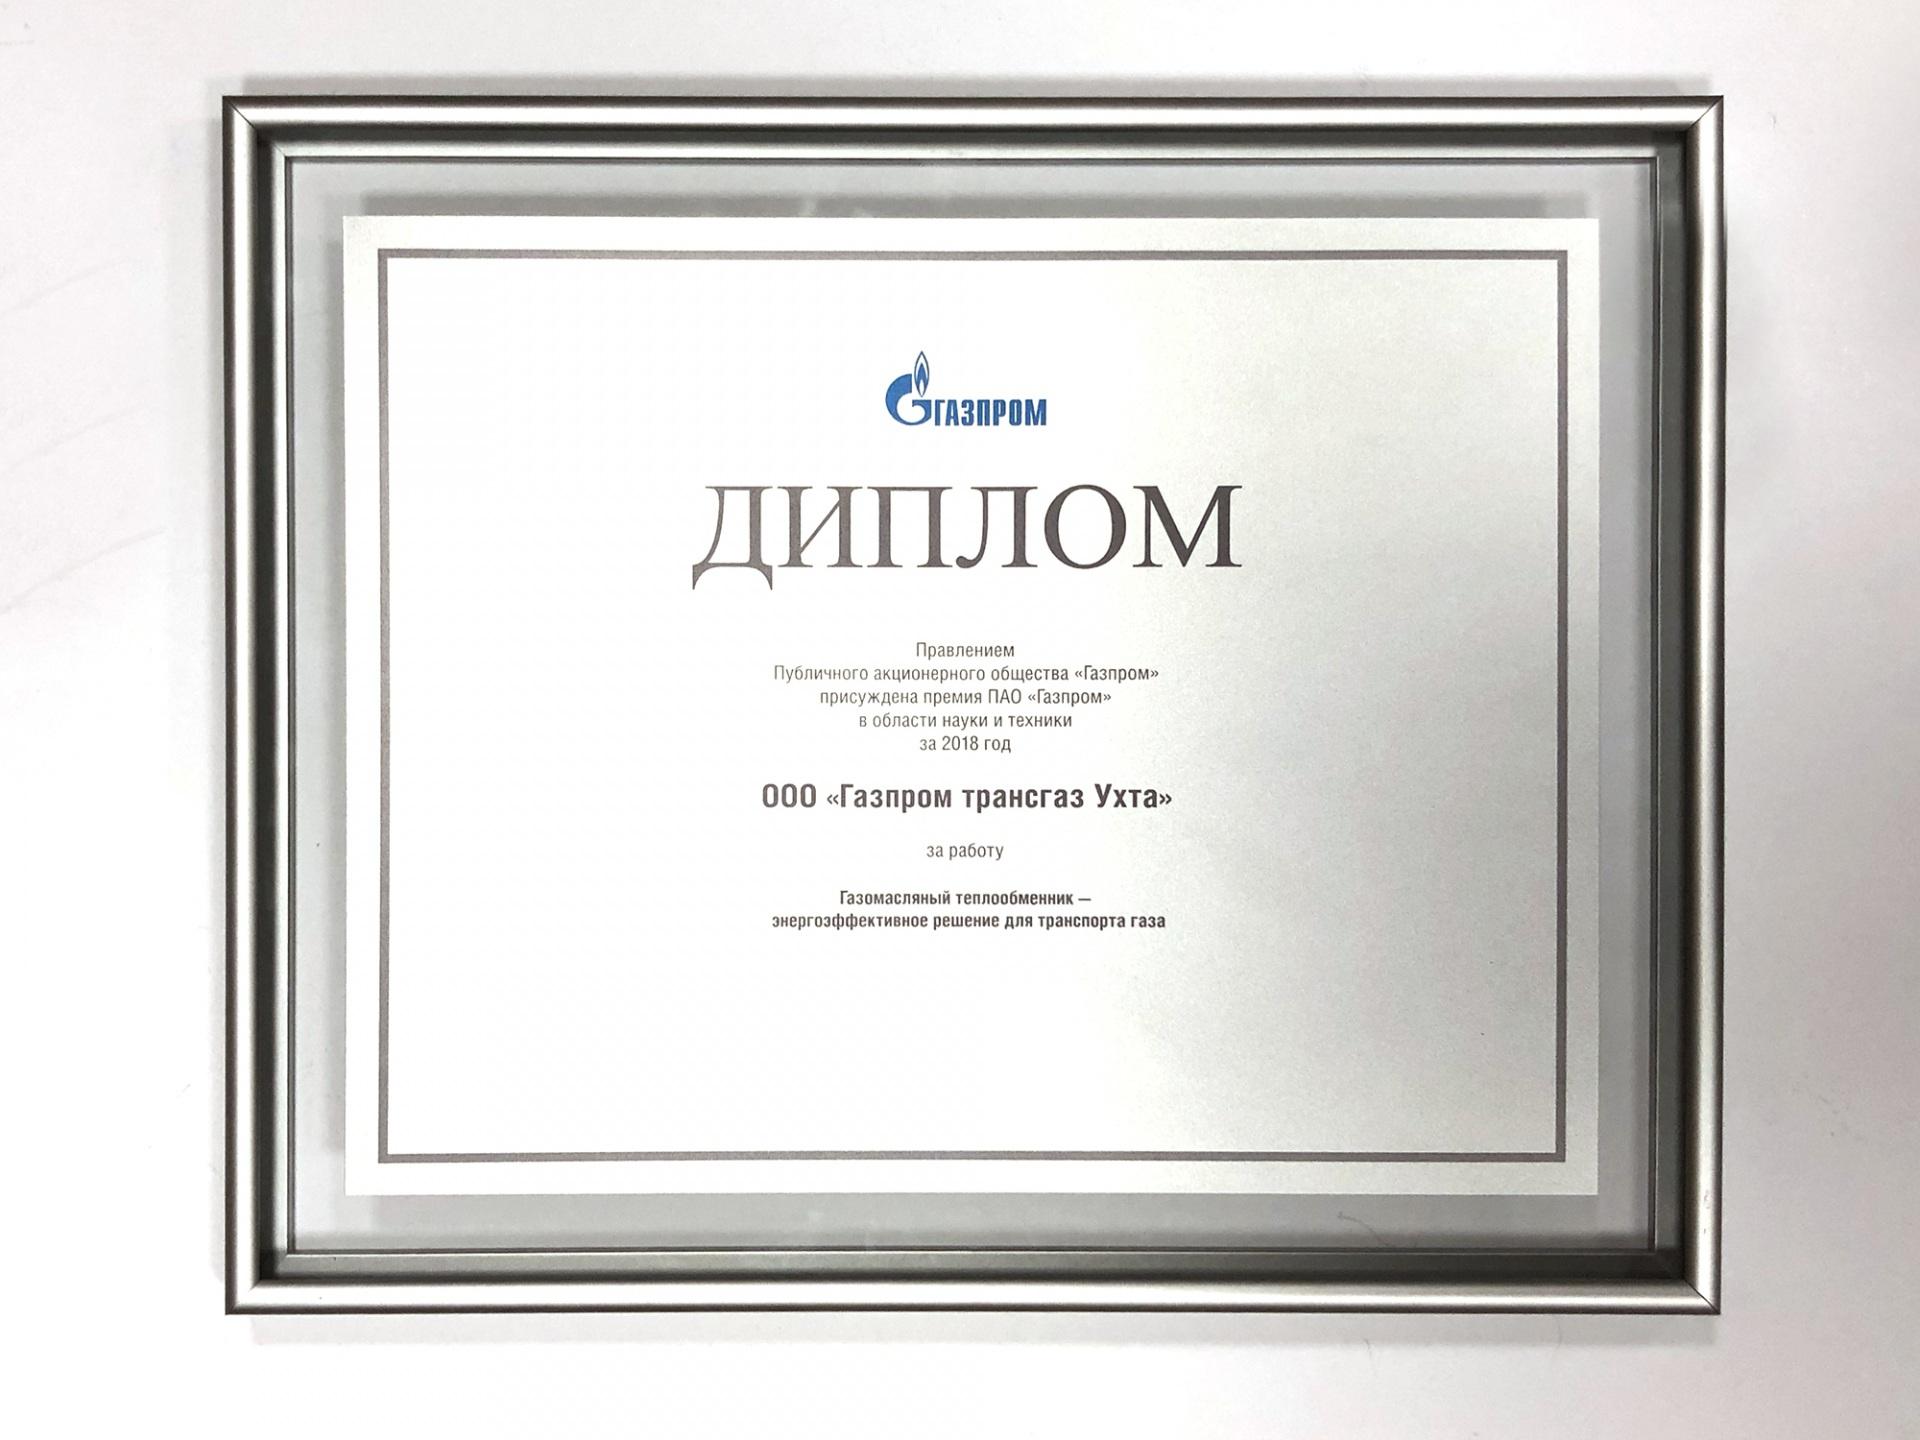 Nagrada-Adamenko-SA.jpg